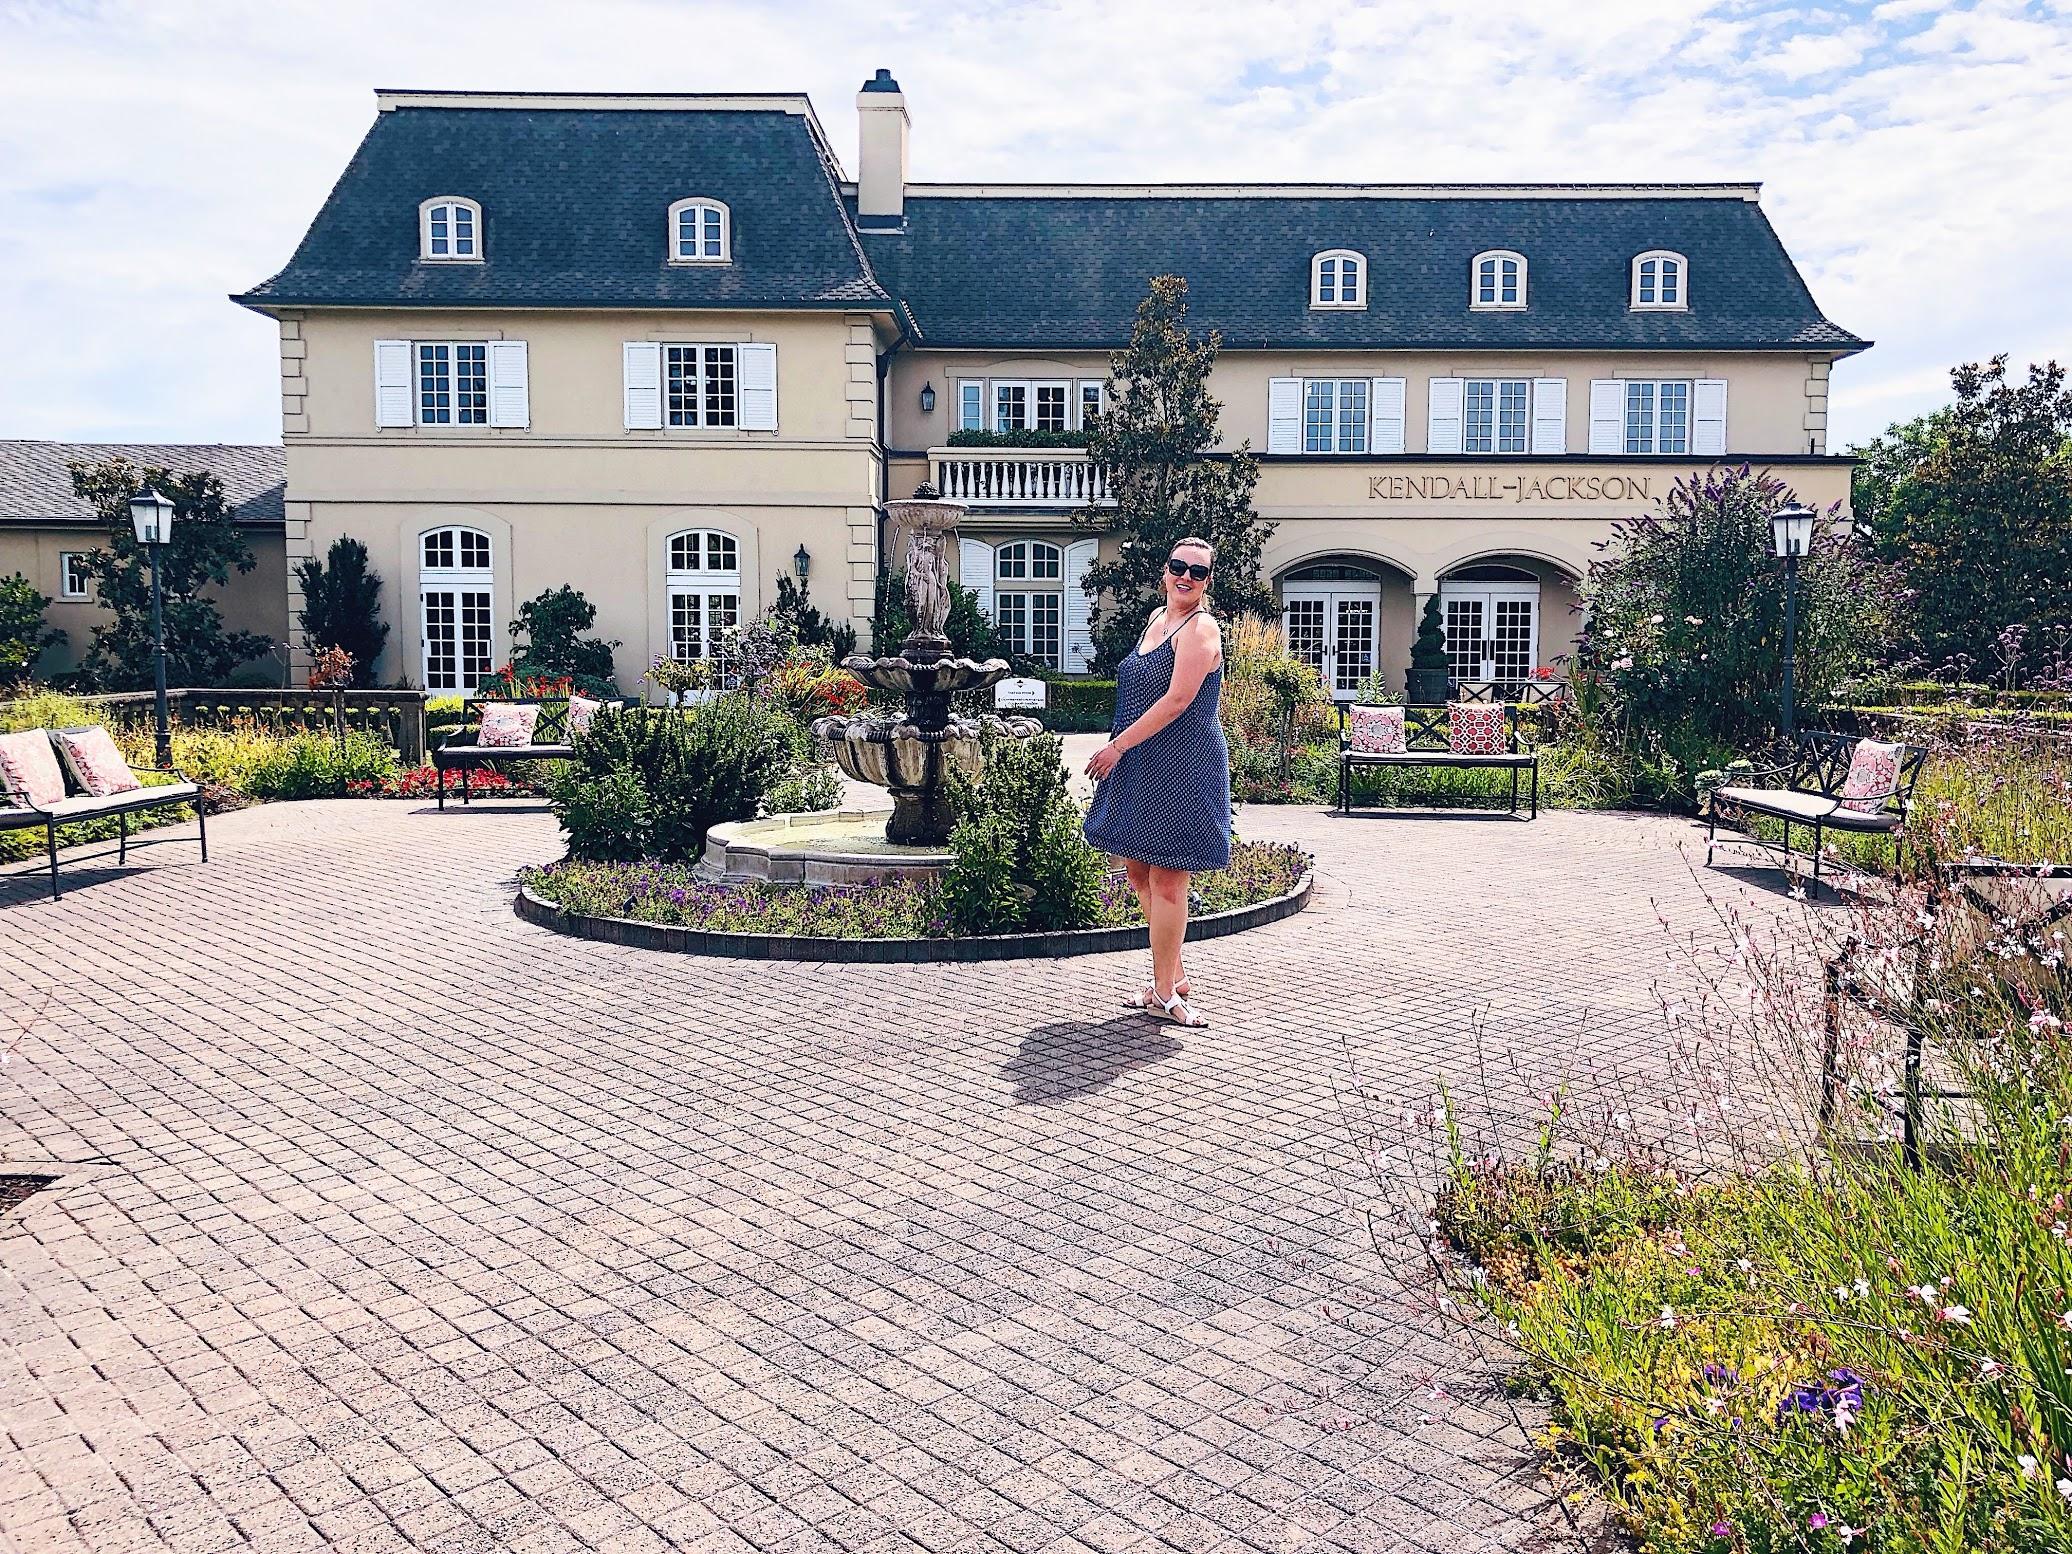 Kendall-Jackson Winery Chateau